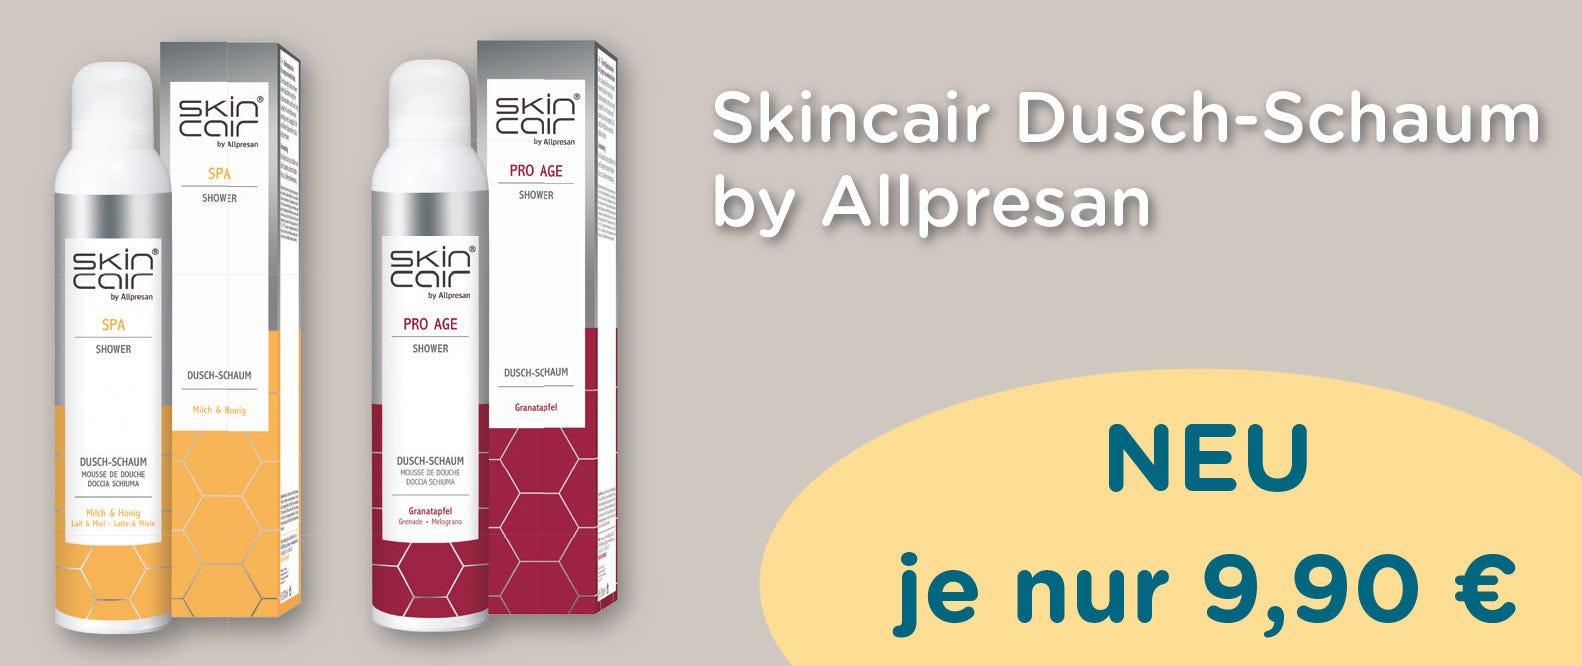 Skincair Body Dusche zum Sonderpreis